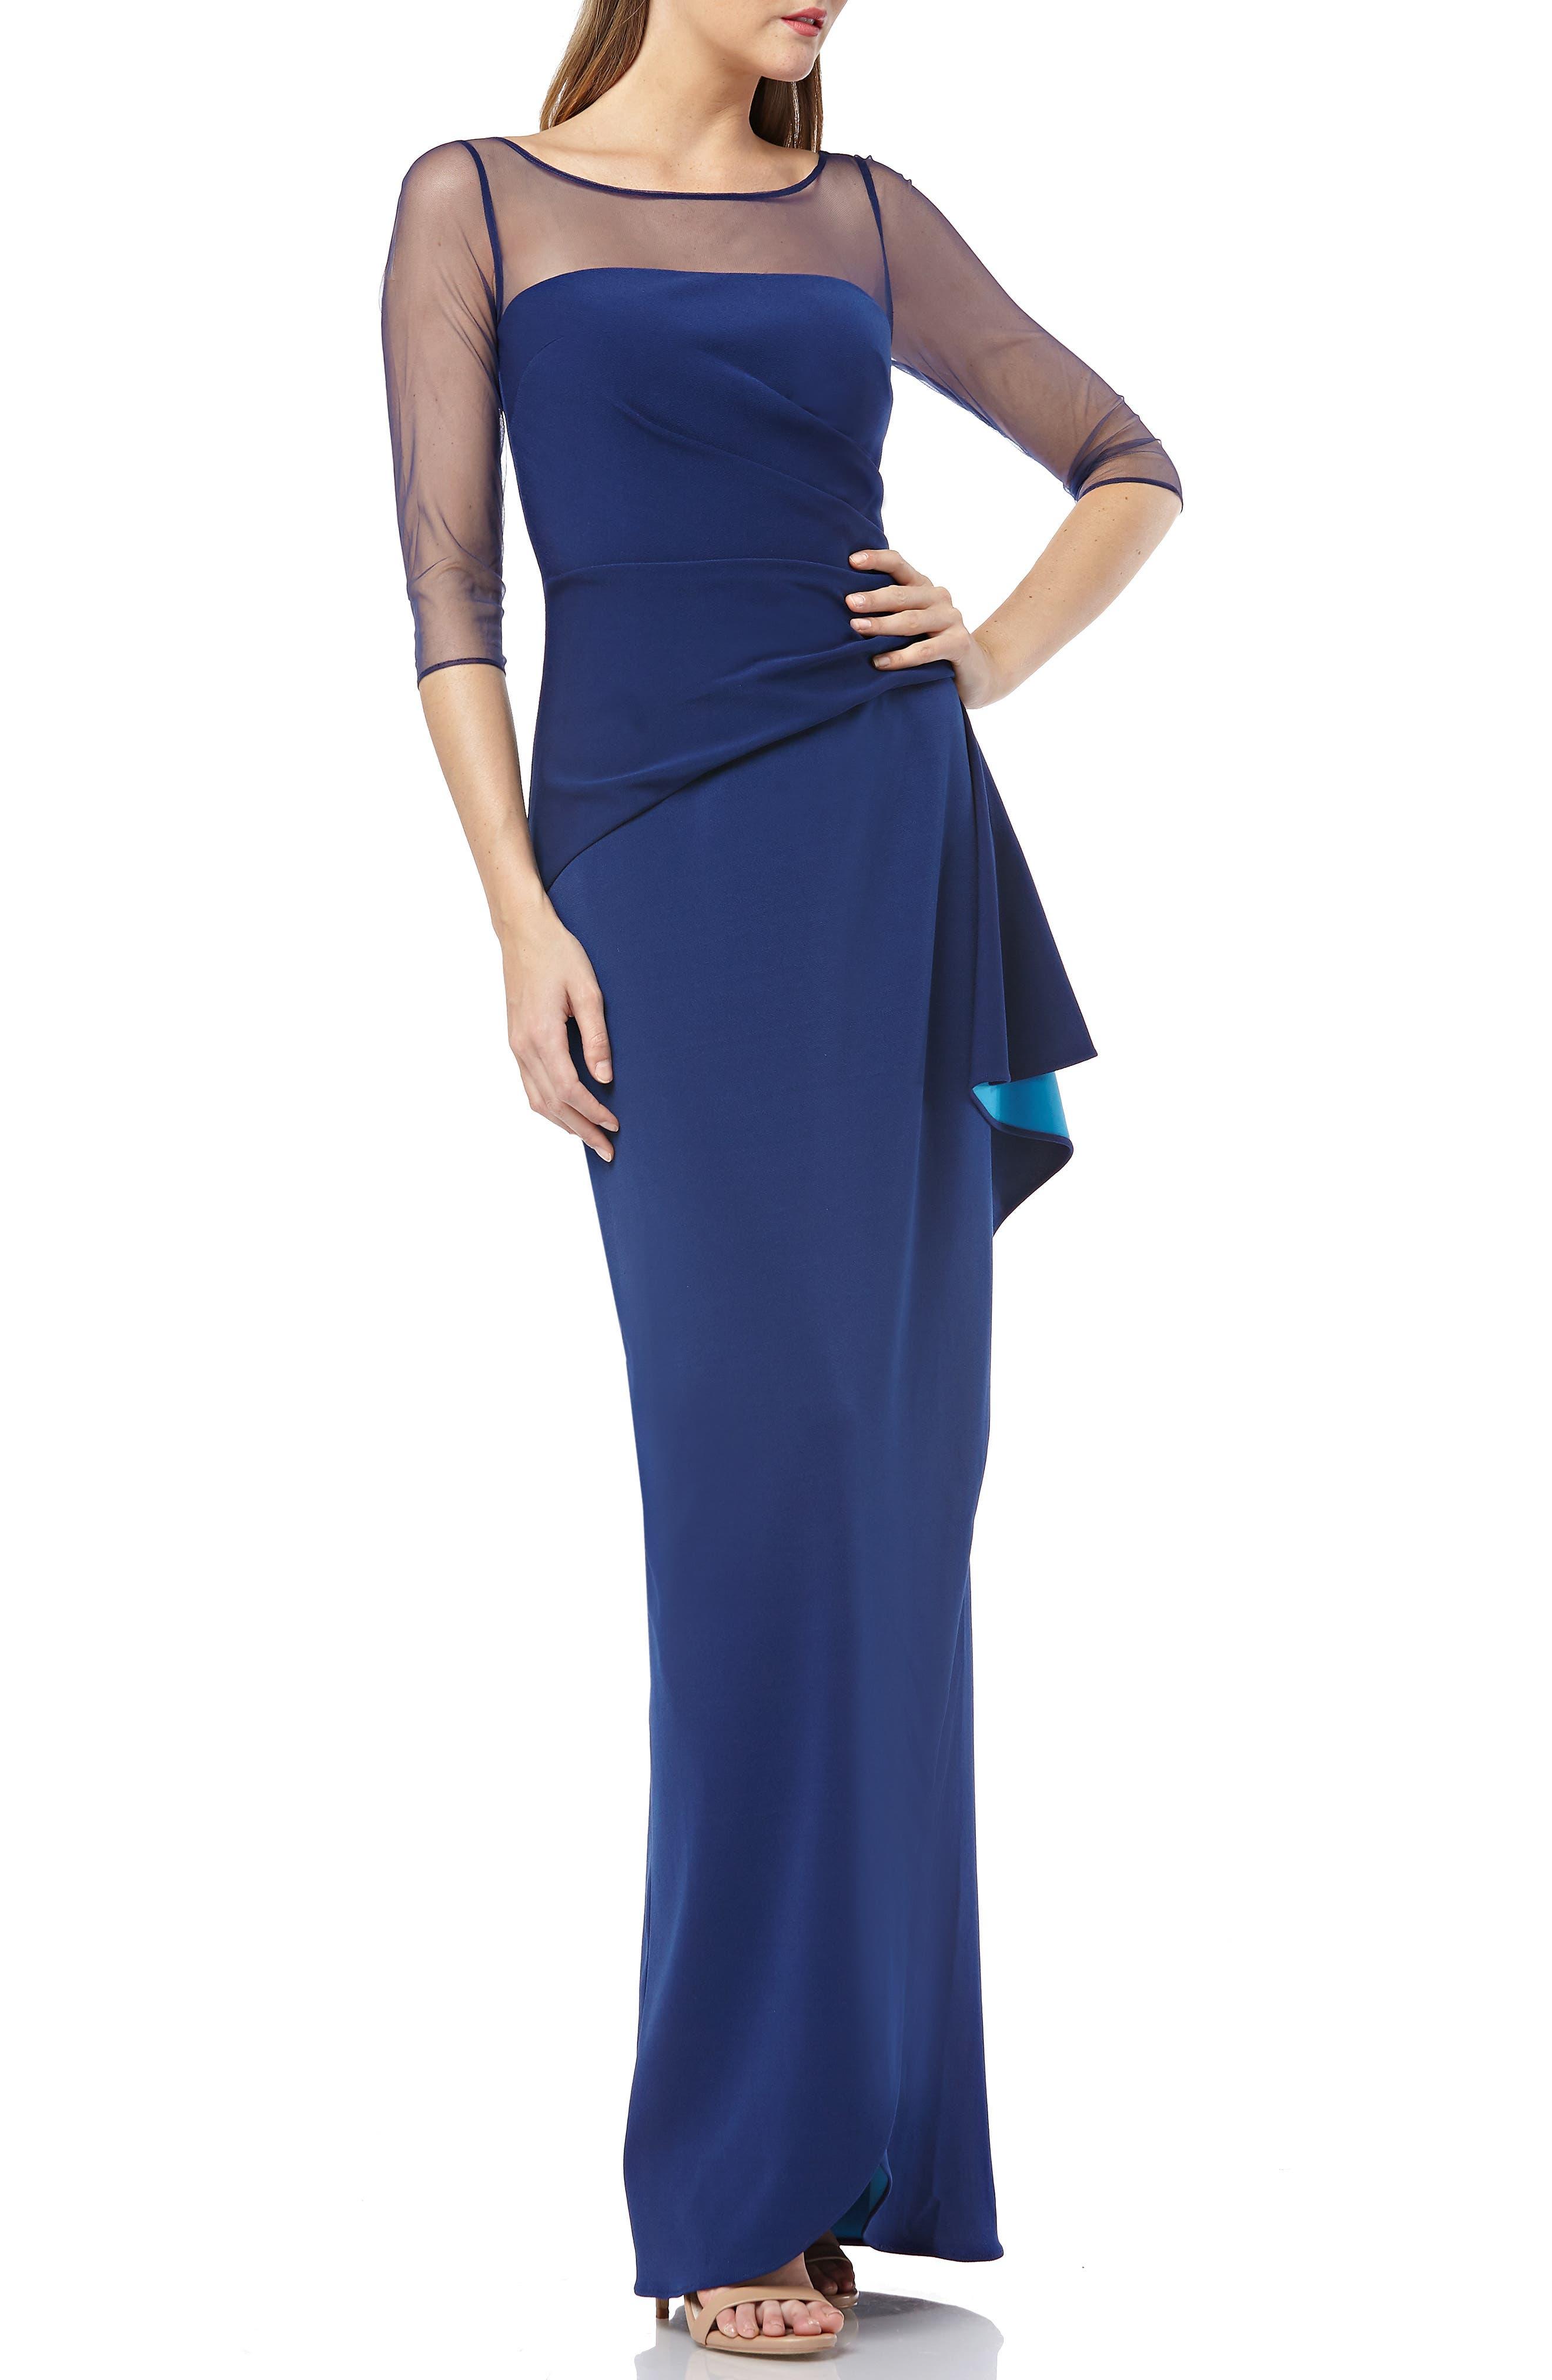 Js Collections Illusion Yoke Bonded Crepe Evening Dress, Blue